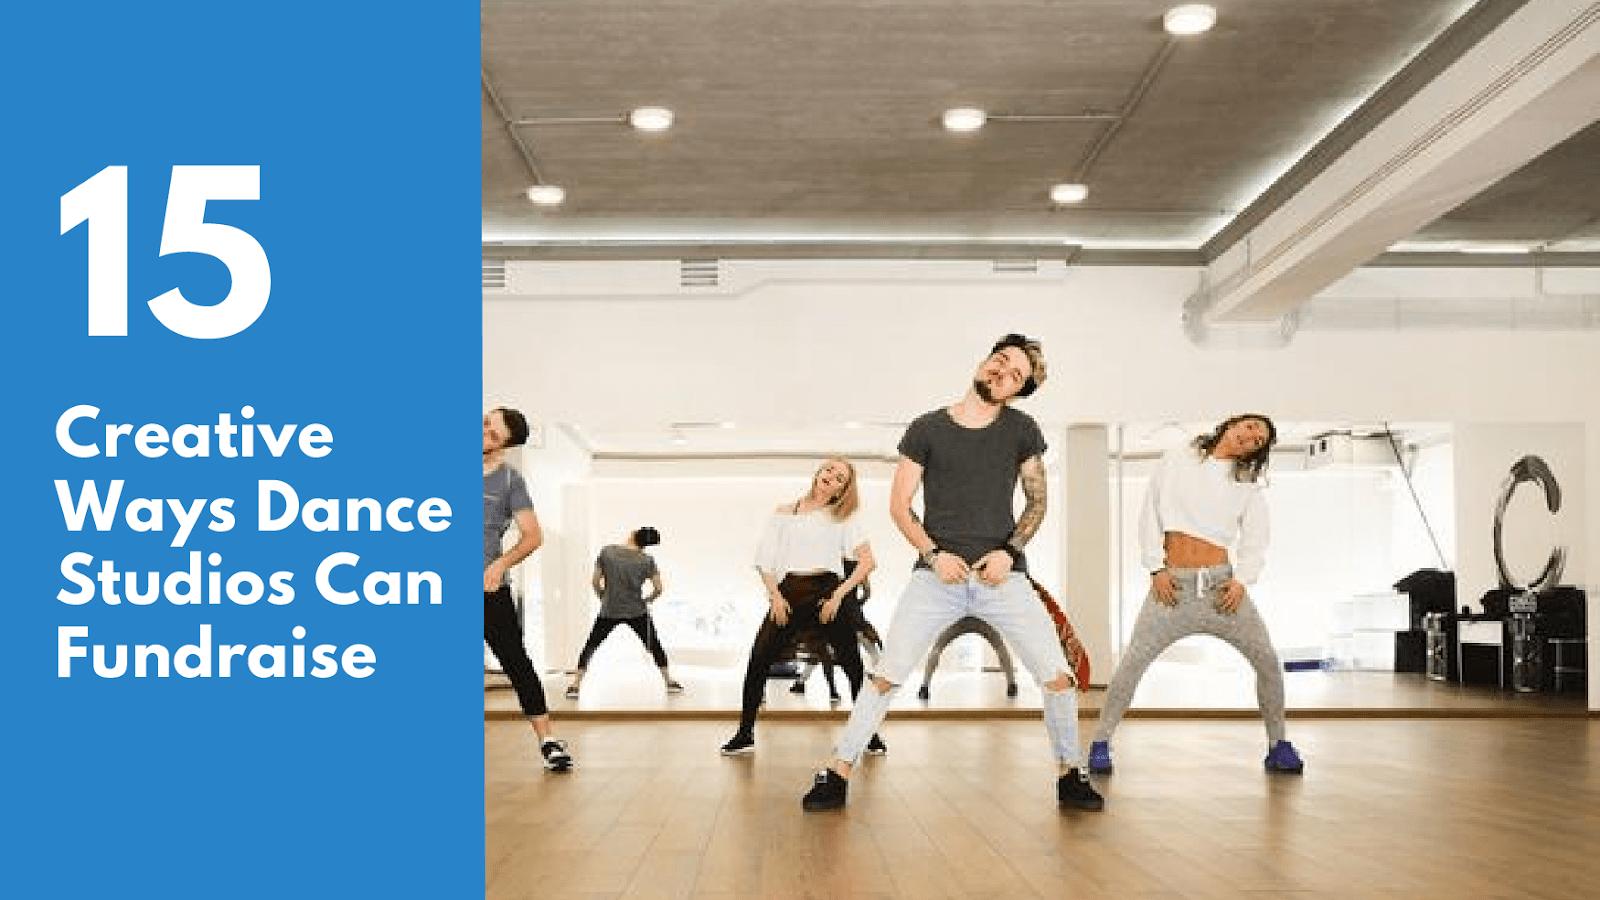 fundraising for dance studios